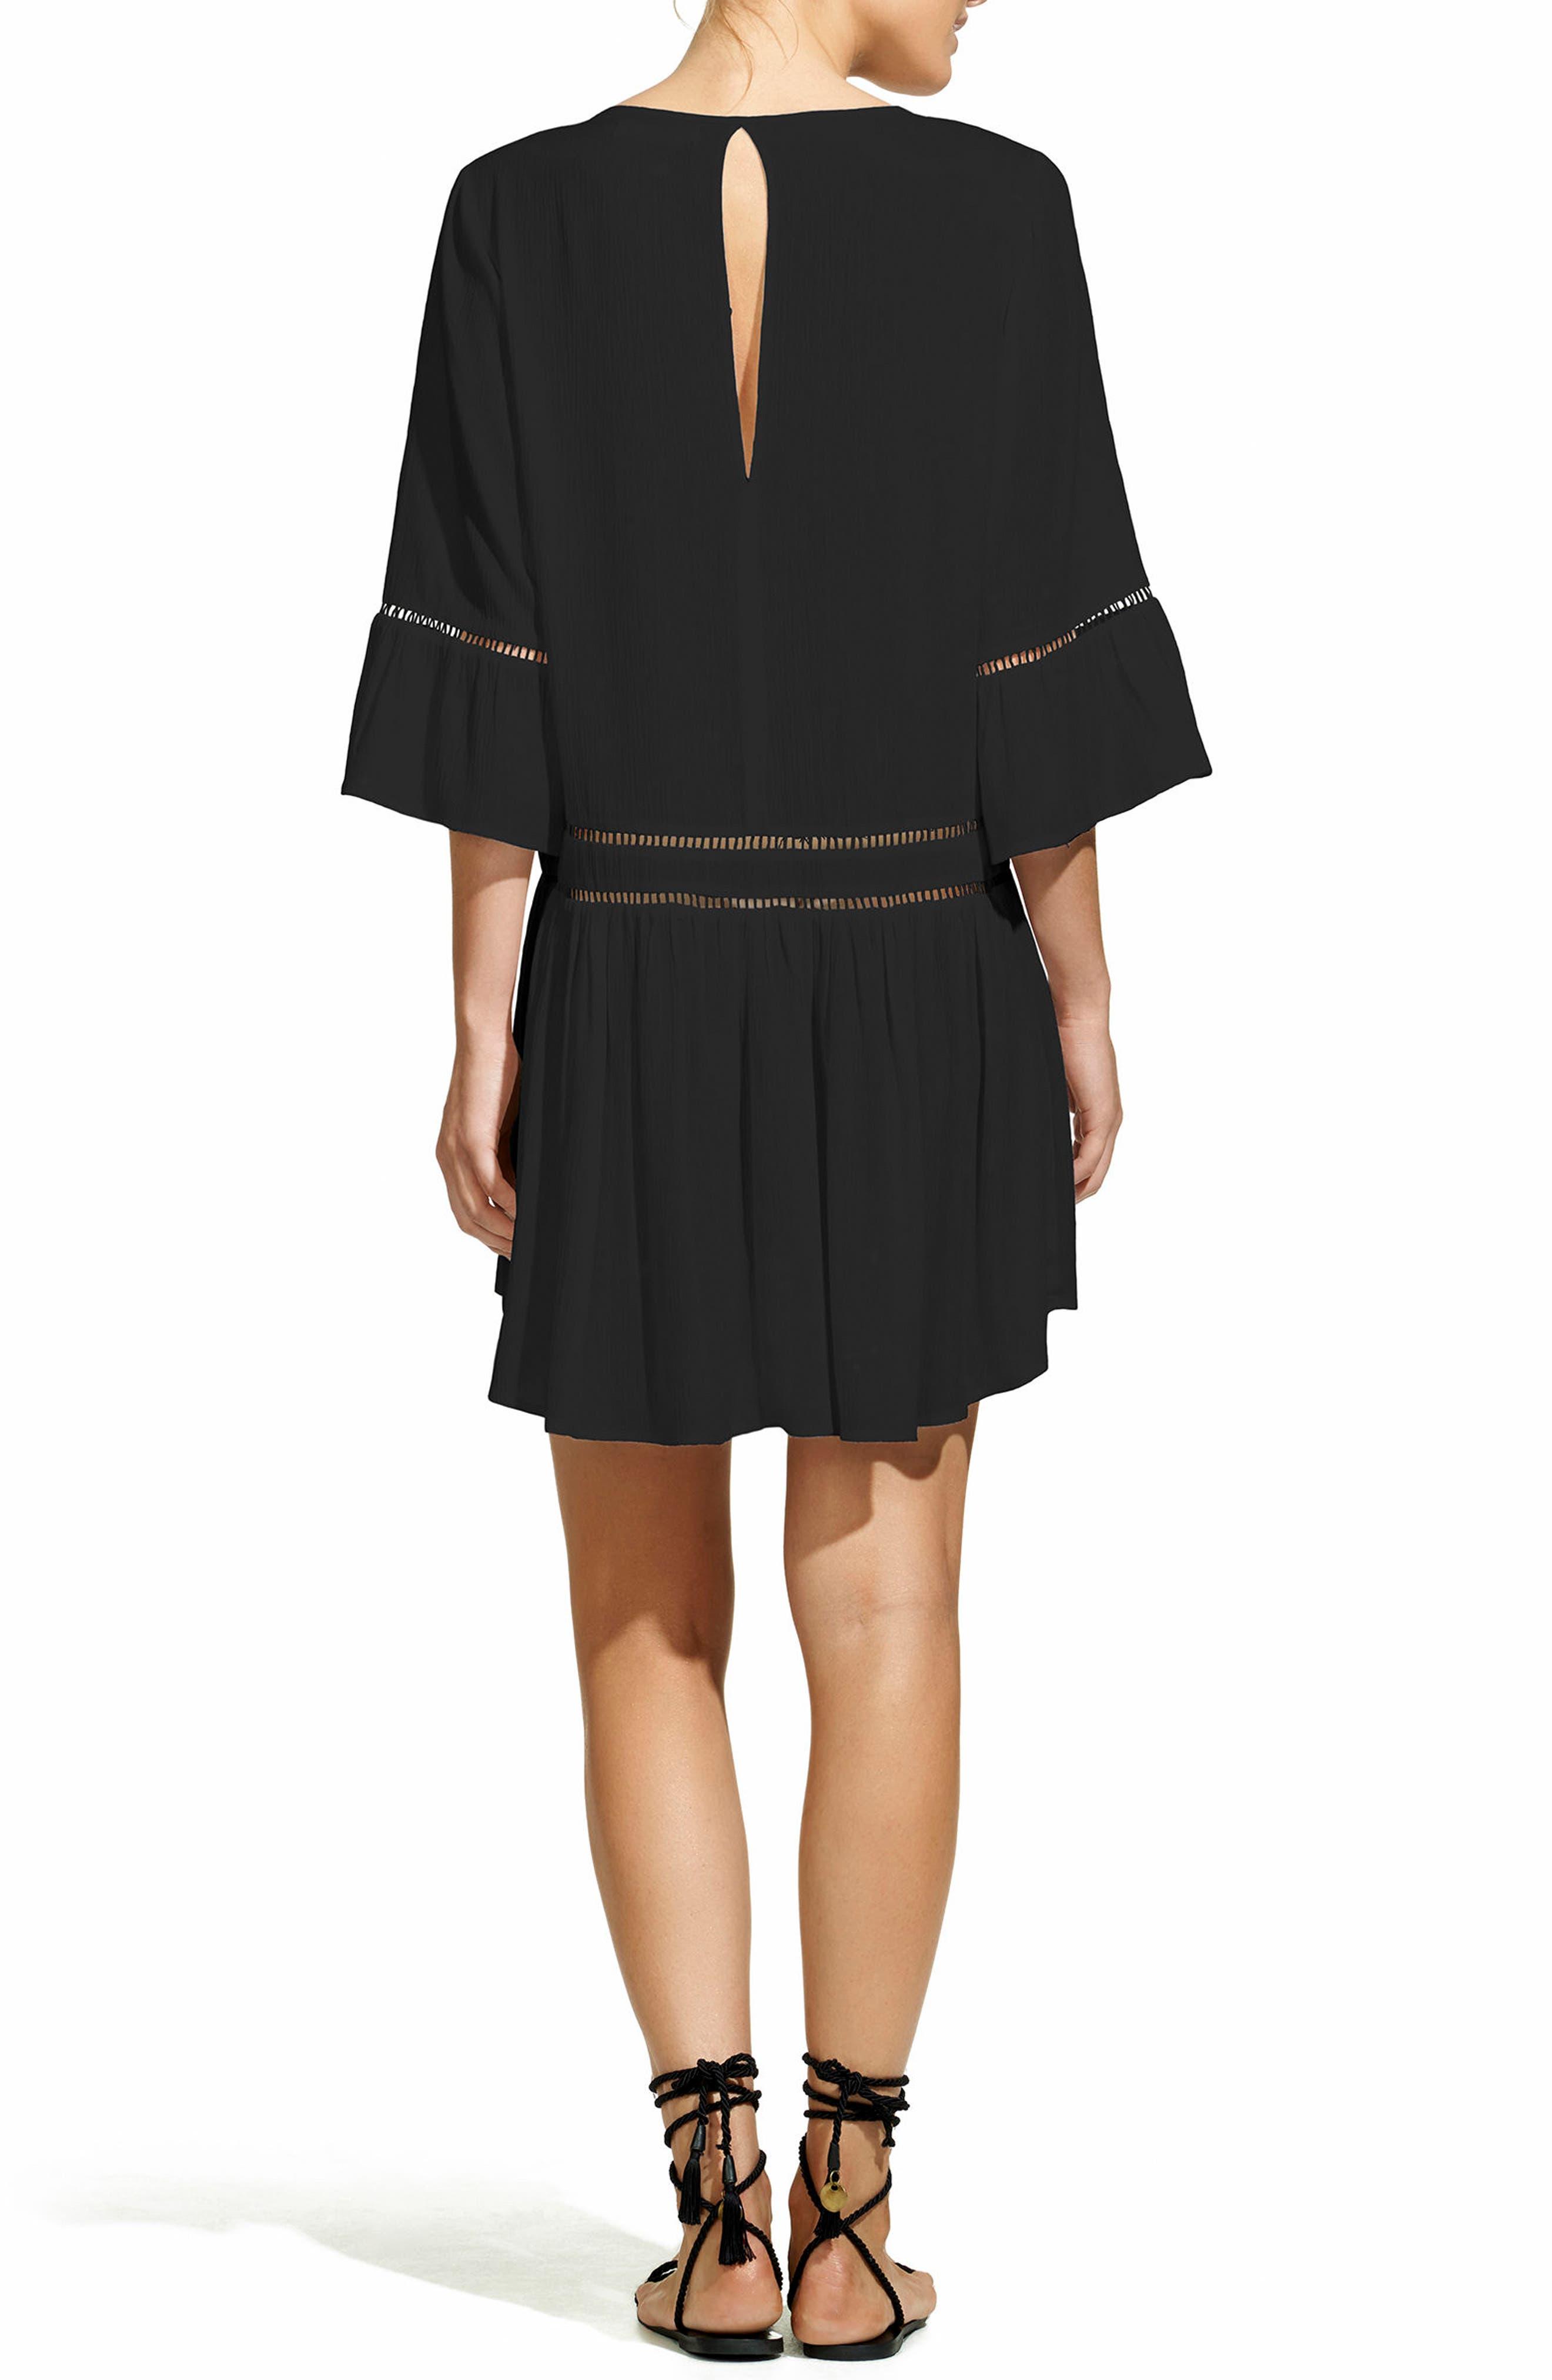 VIX SWIMWEAR, Agatha Cover-Up Dress, Alternate thumbnail 2, color, 001